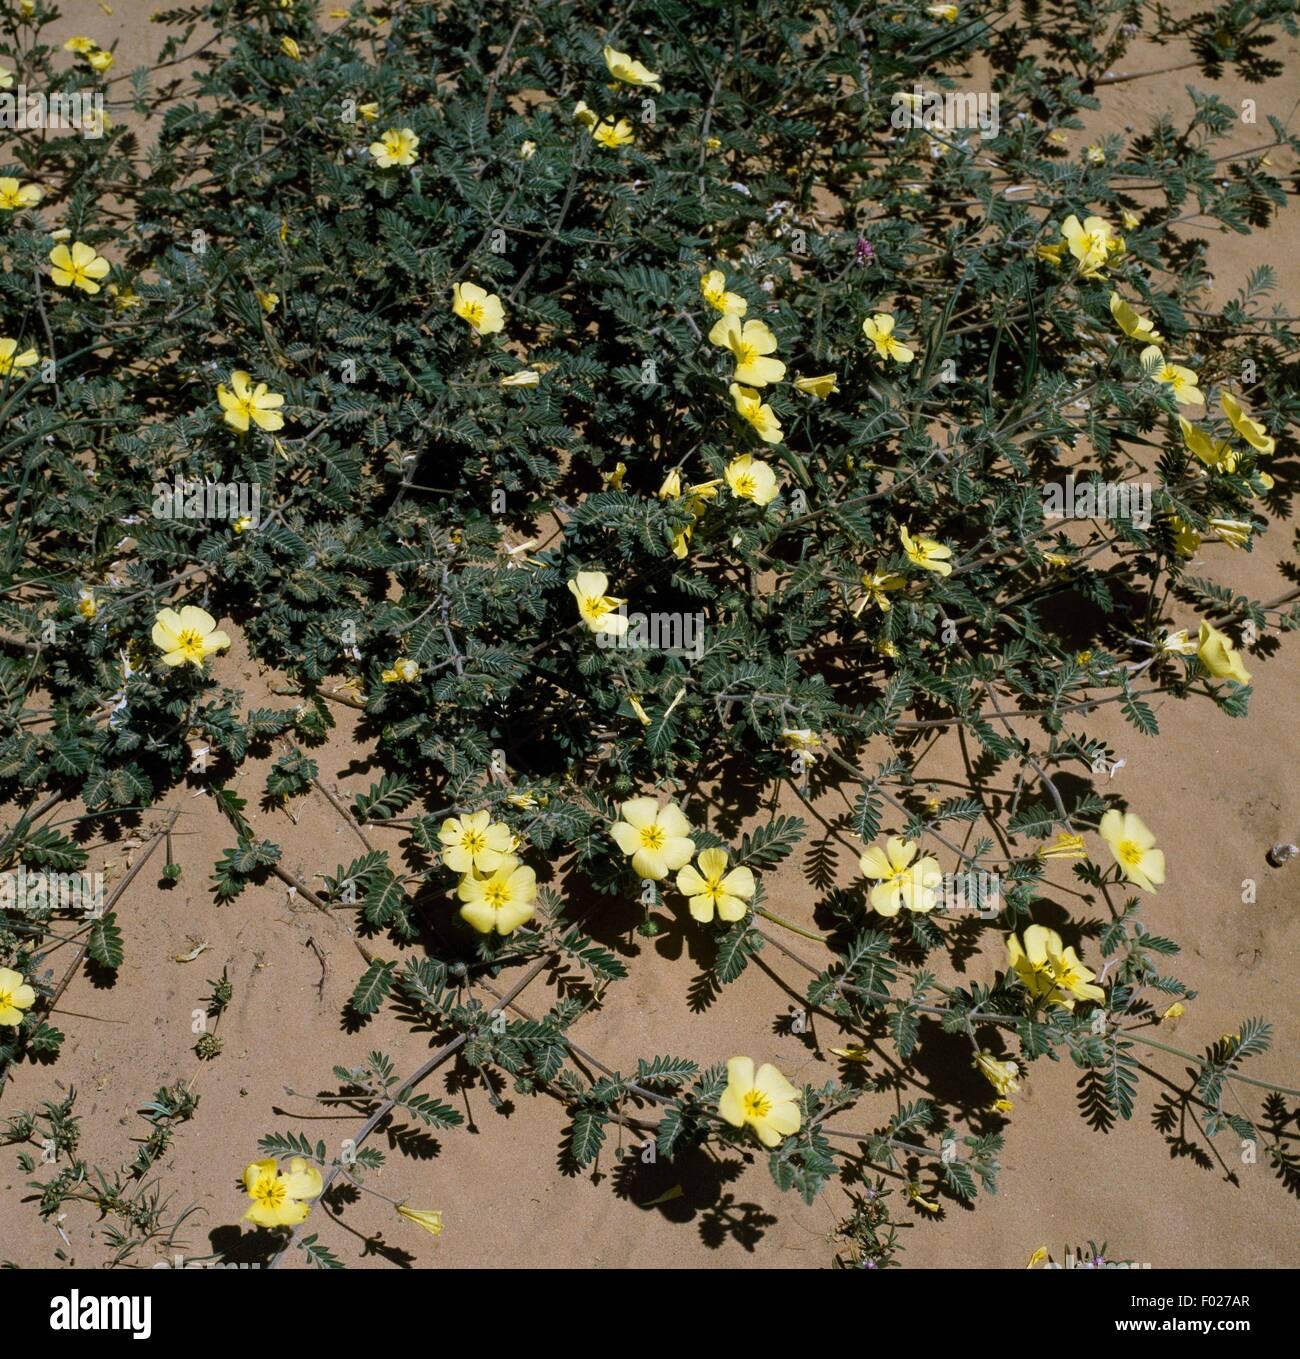 Tribulus Terrestris Stock Photos Images Bindii In Bloom Kgalagadi Transfrontier Park South Africa